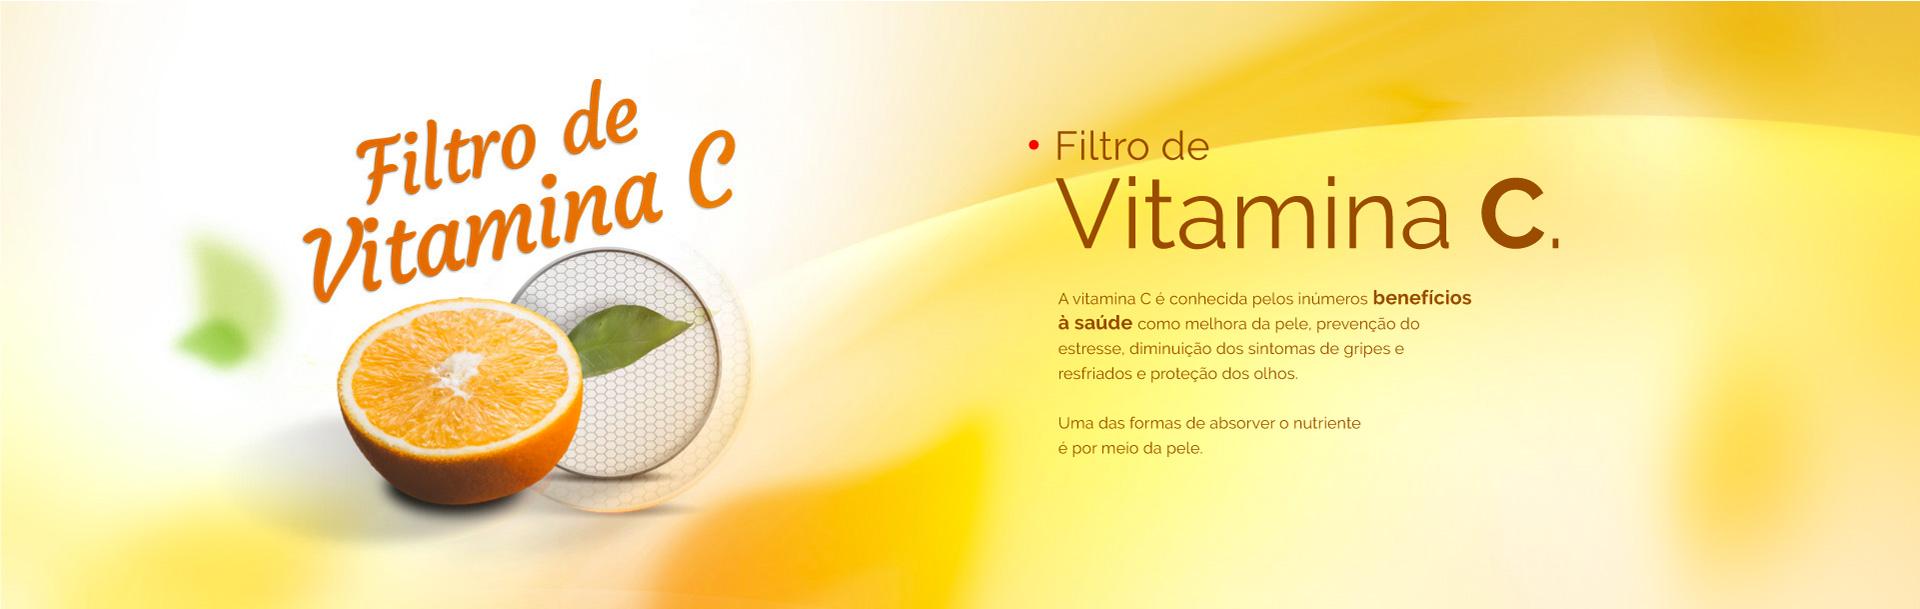 Filtro Vitamina C